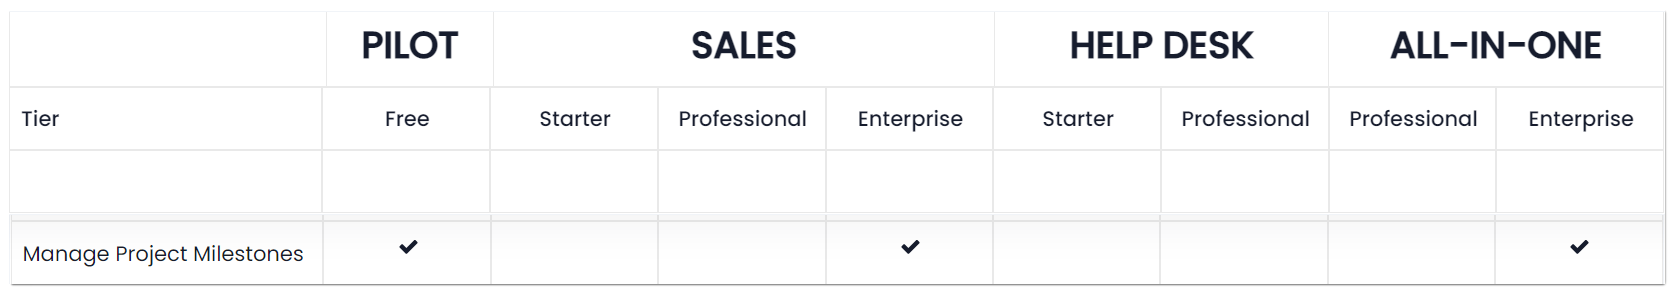 Project Milestones - Feature Availability